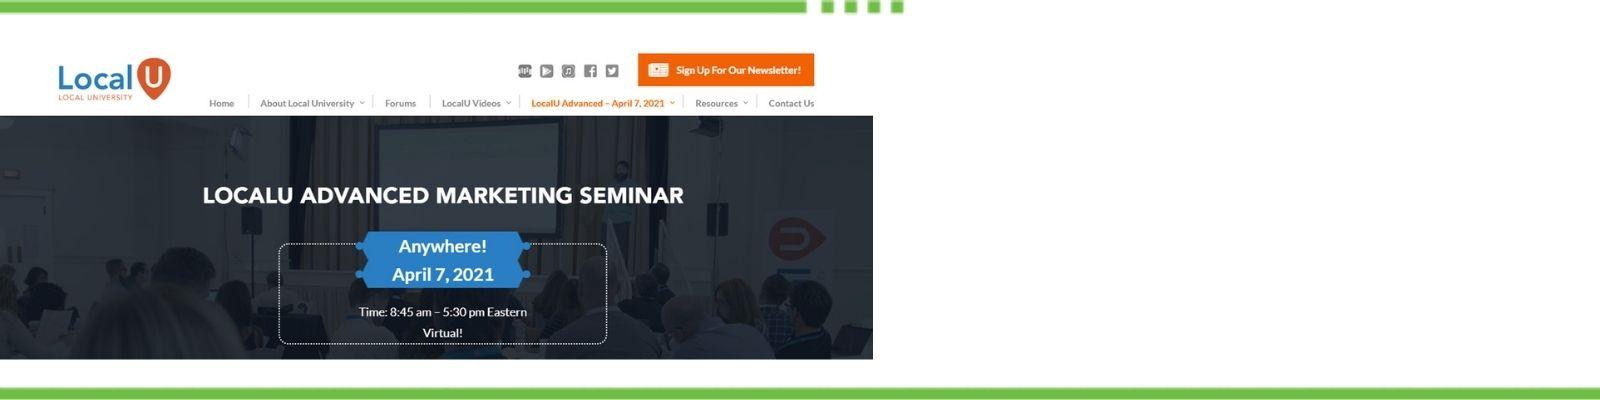 LocalU Advanced Marketing Summit